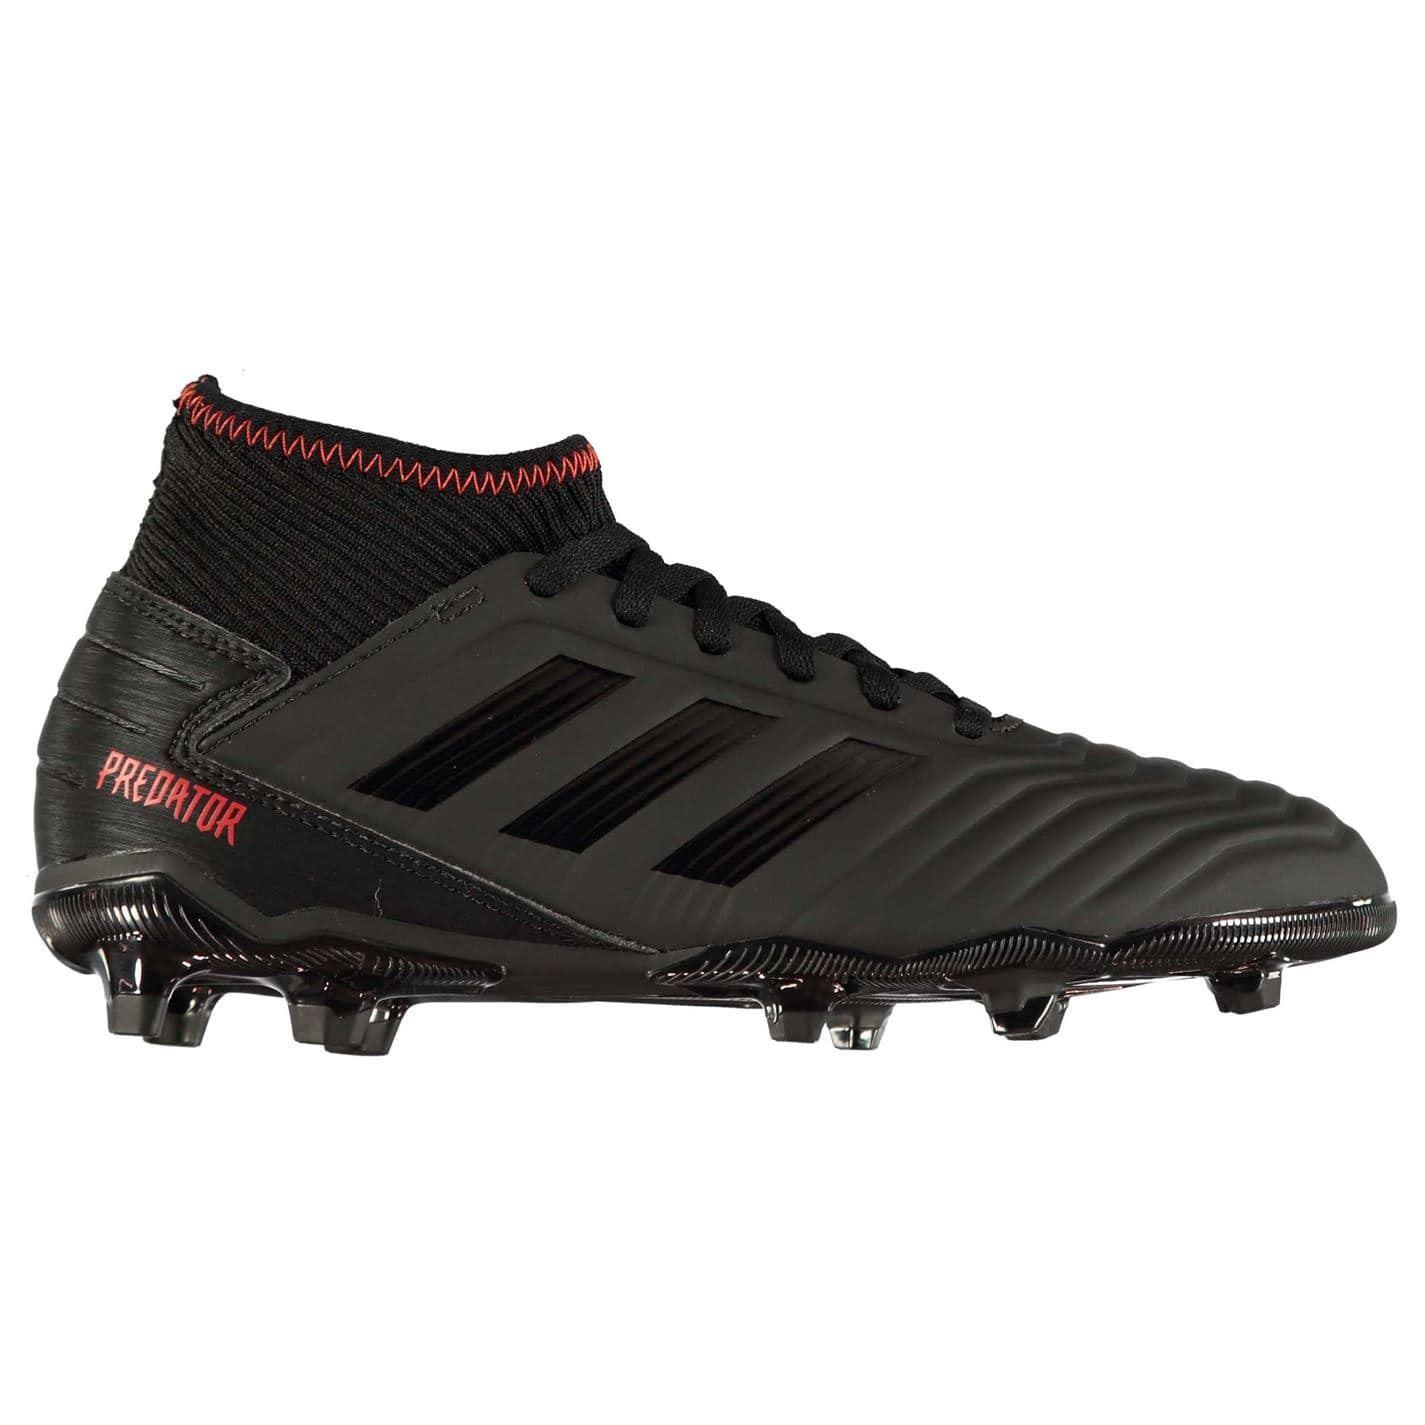 adidas Predator 19.3 s FG Football